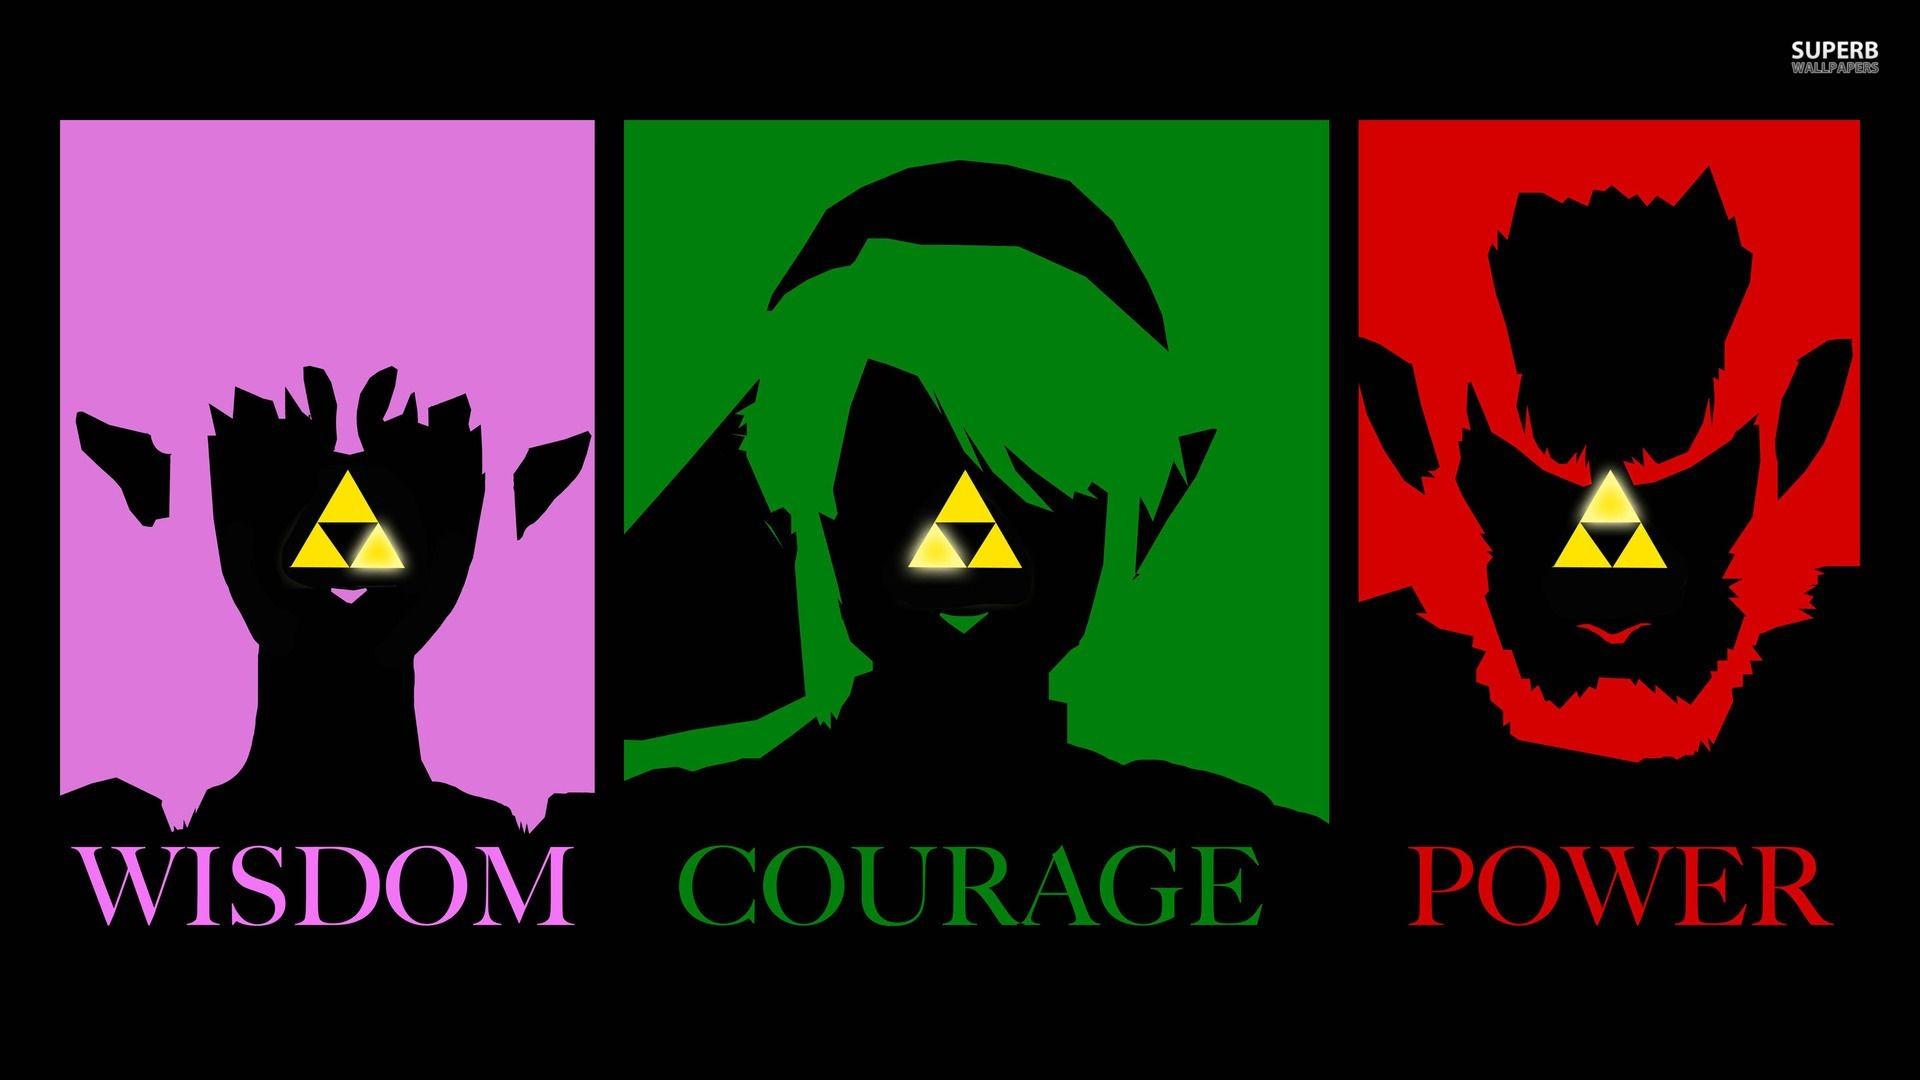 Triforce – The Legend of Zelda wallpaper – Game wallpapers – #23489